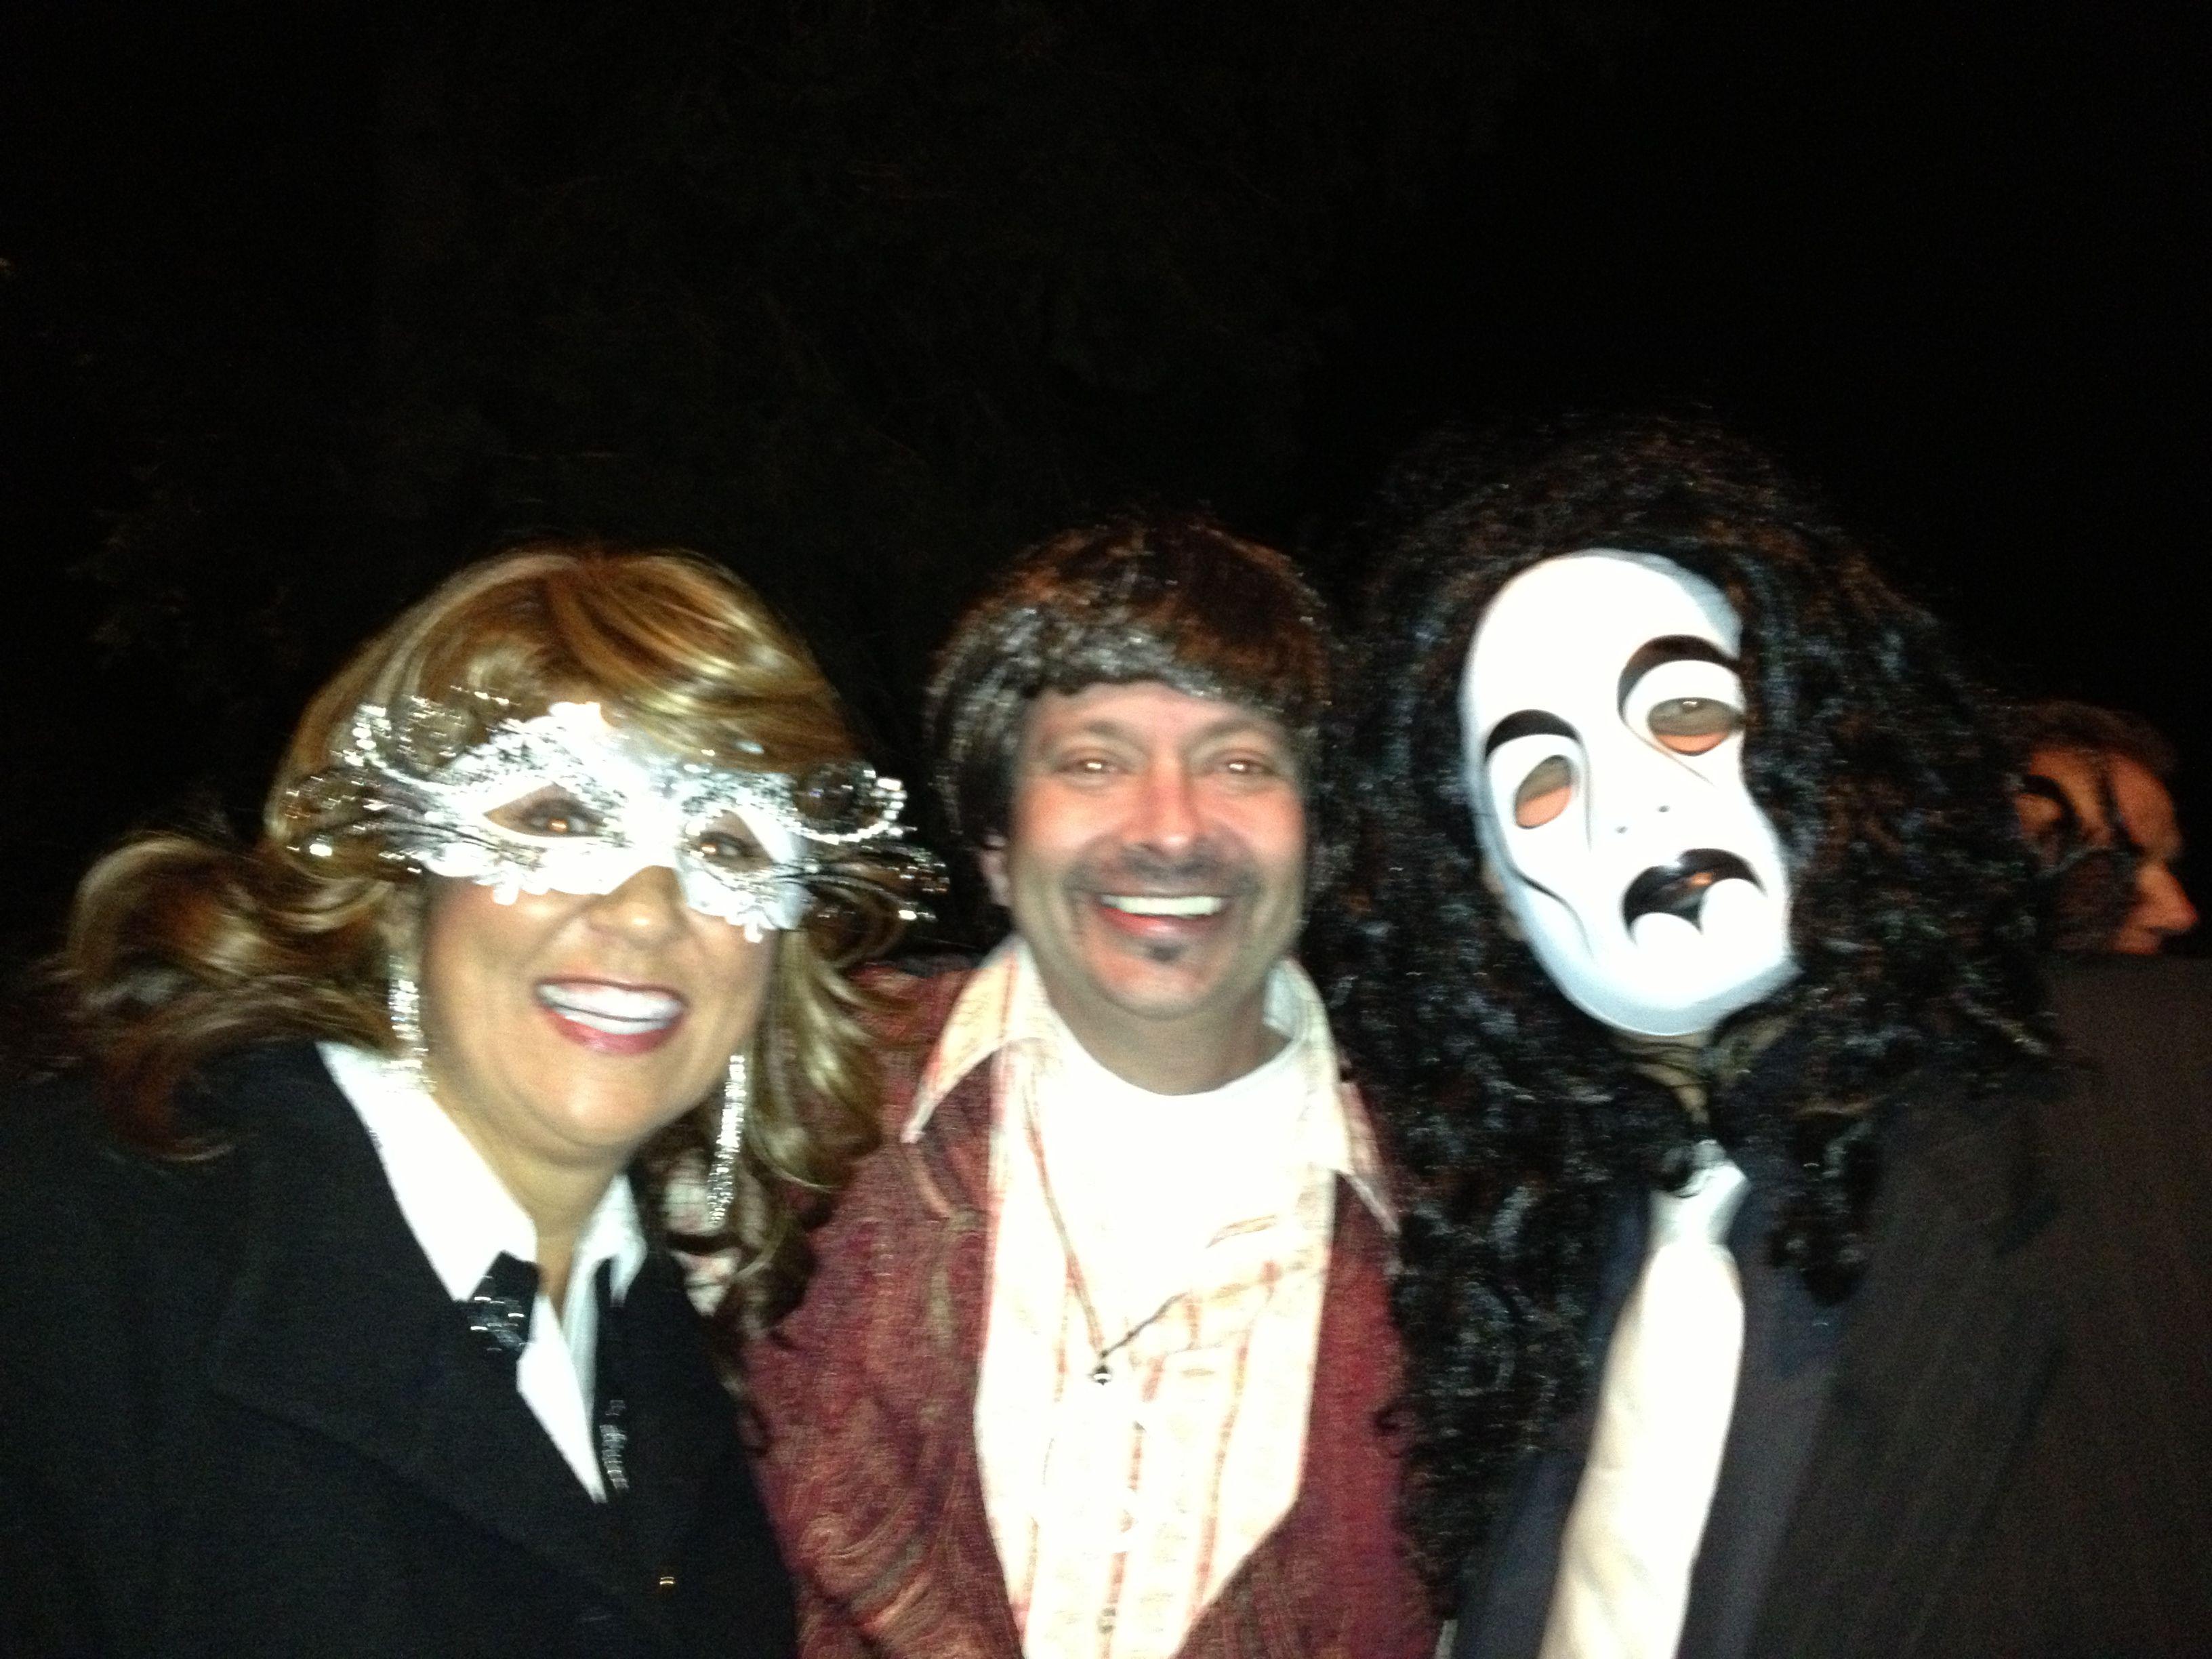 Sharon, Darren & Scott - Halloween 2013